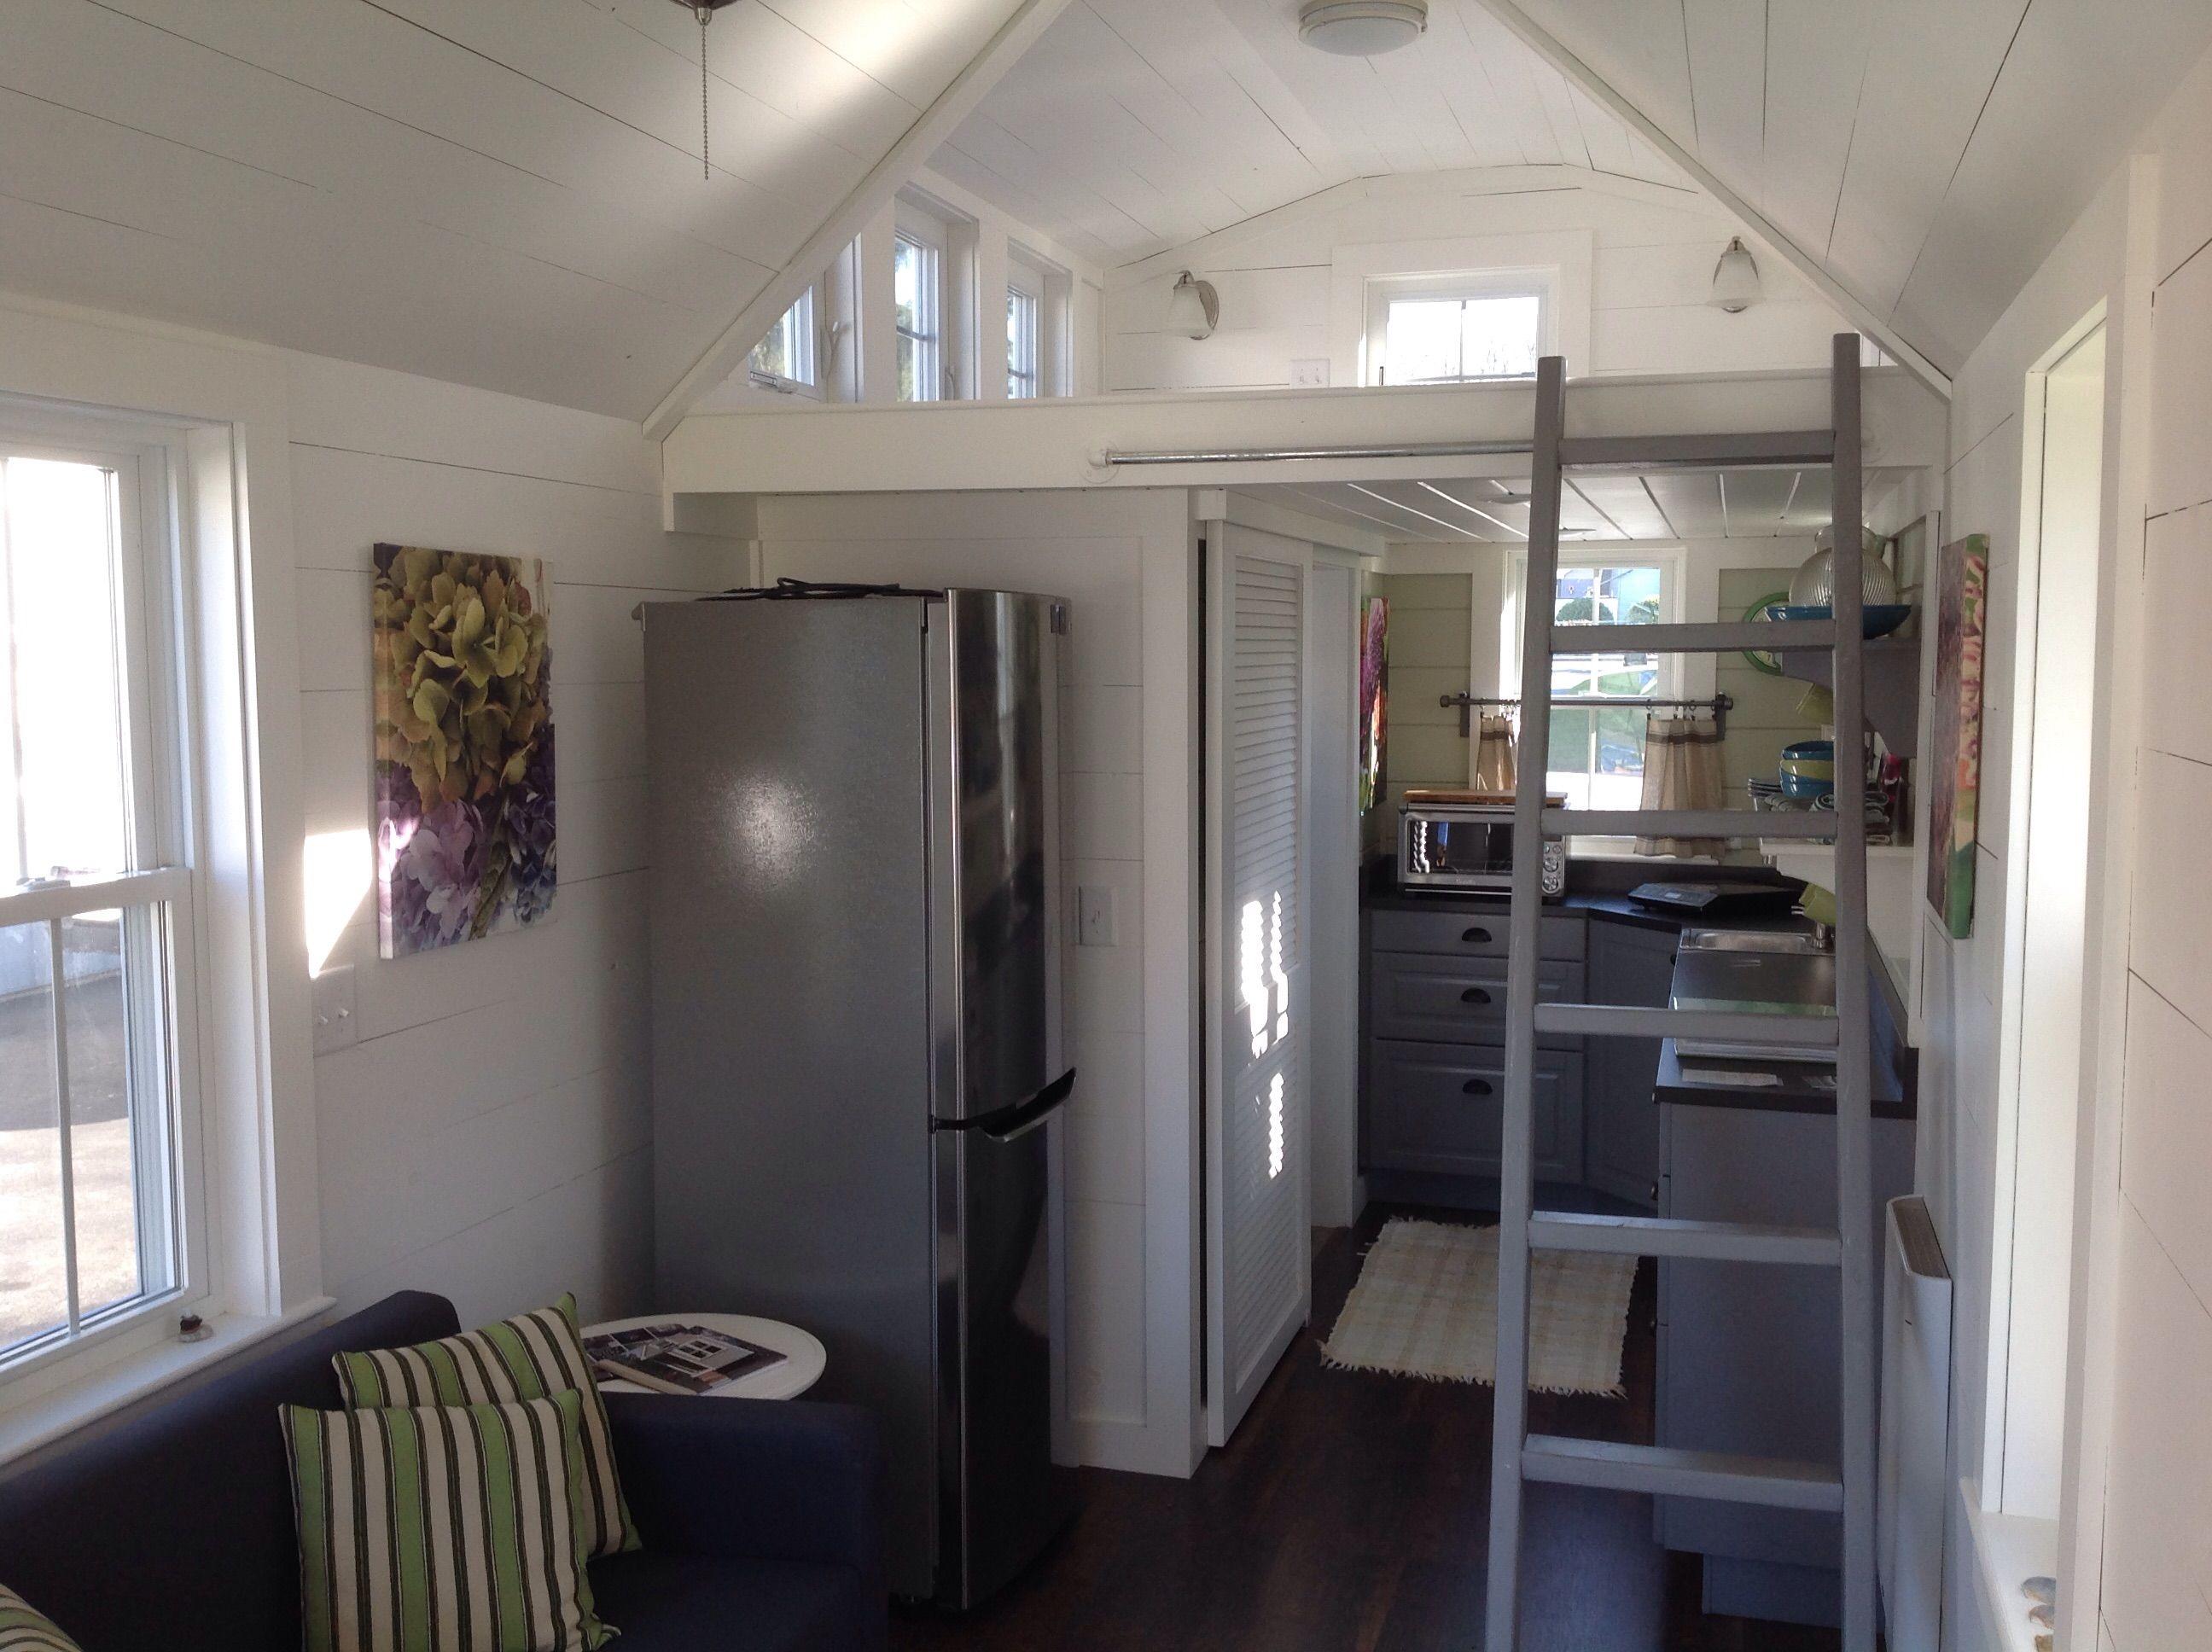 Tiny house for sale - Tiny House Listings | Tiny Houses